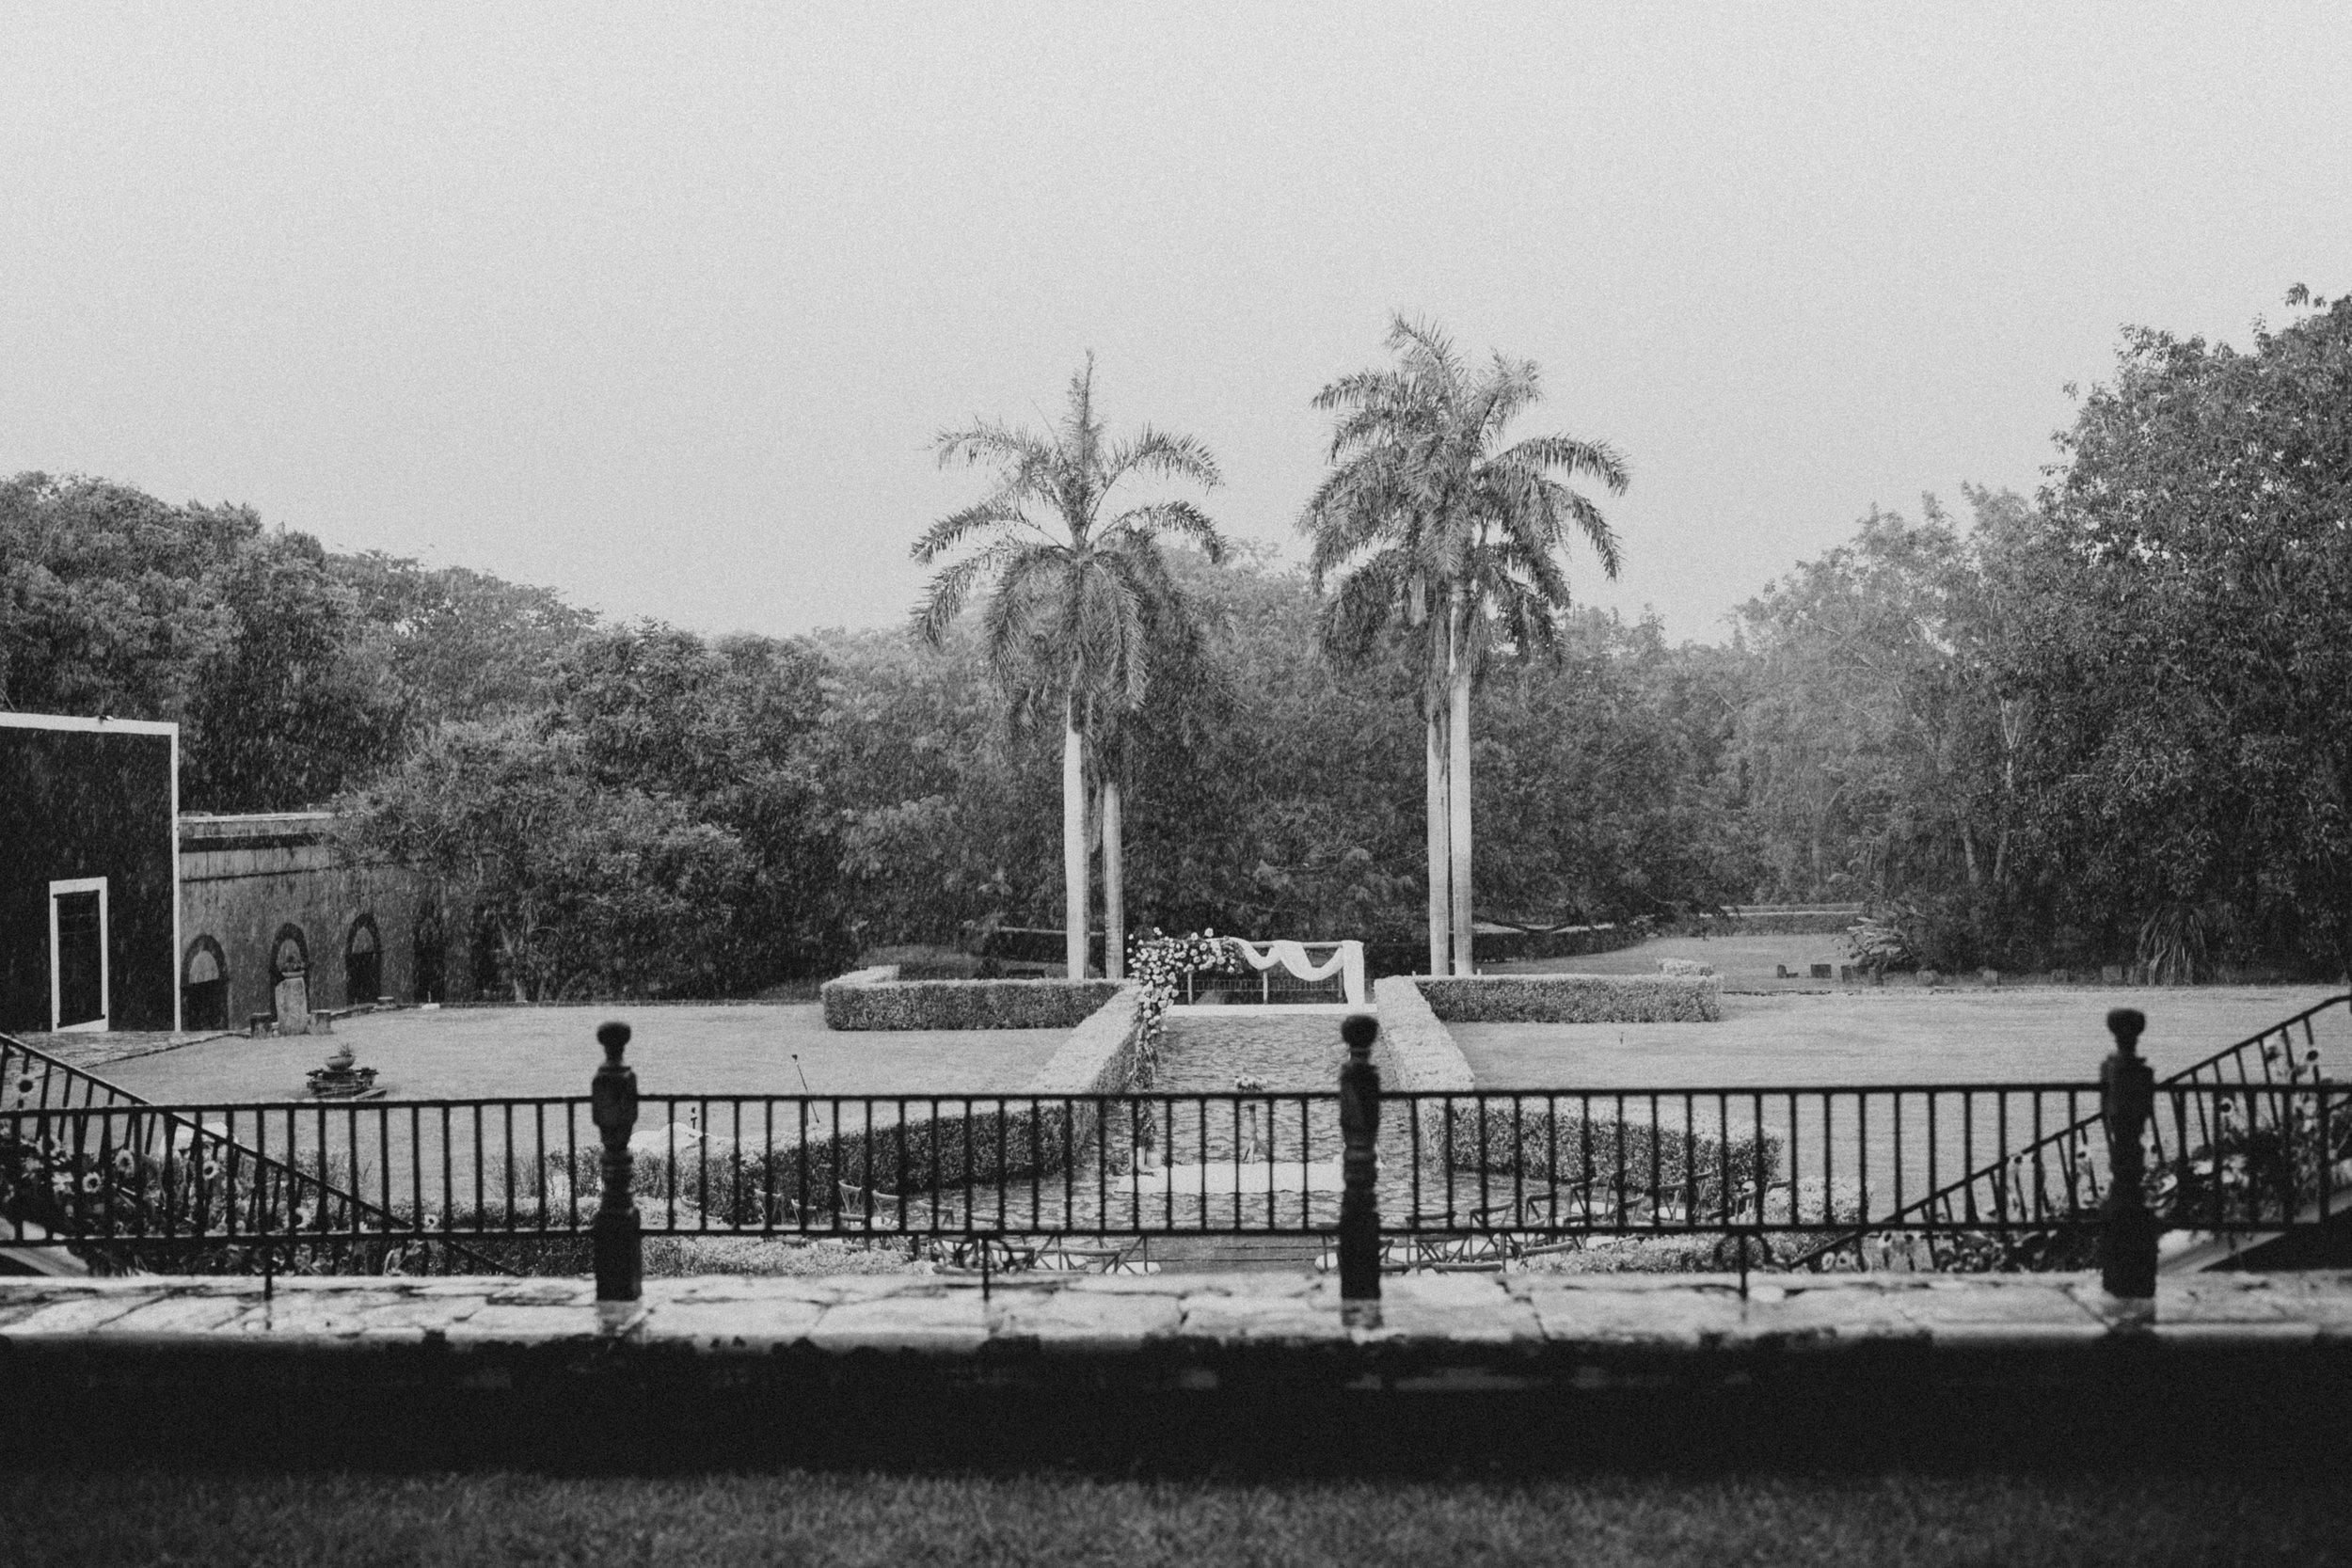 Hacienda Temozon Yucatan Mexico Wedding | Ida & Peter Emily Magers Photography-897.jpg